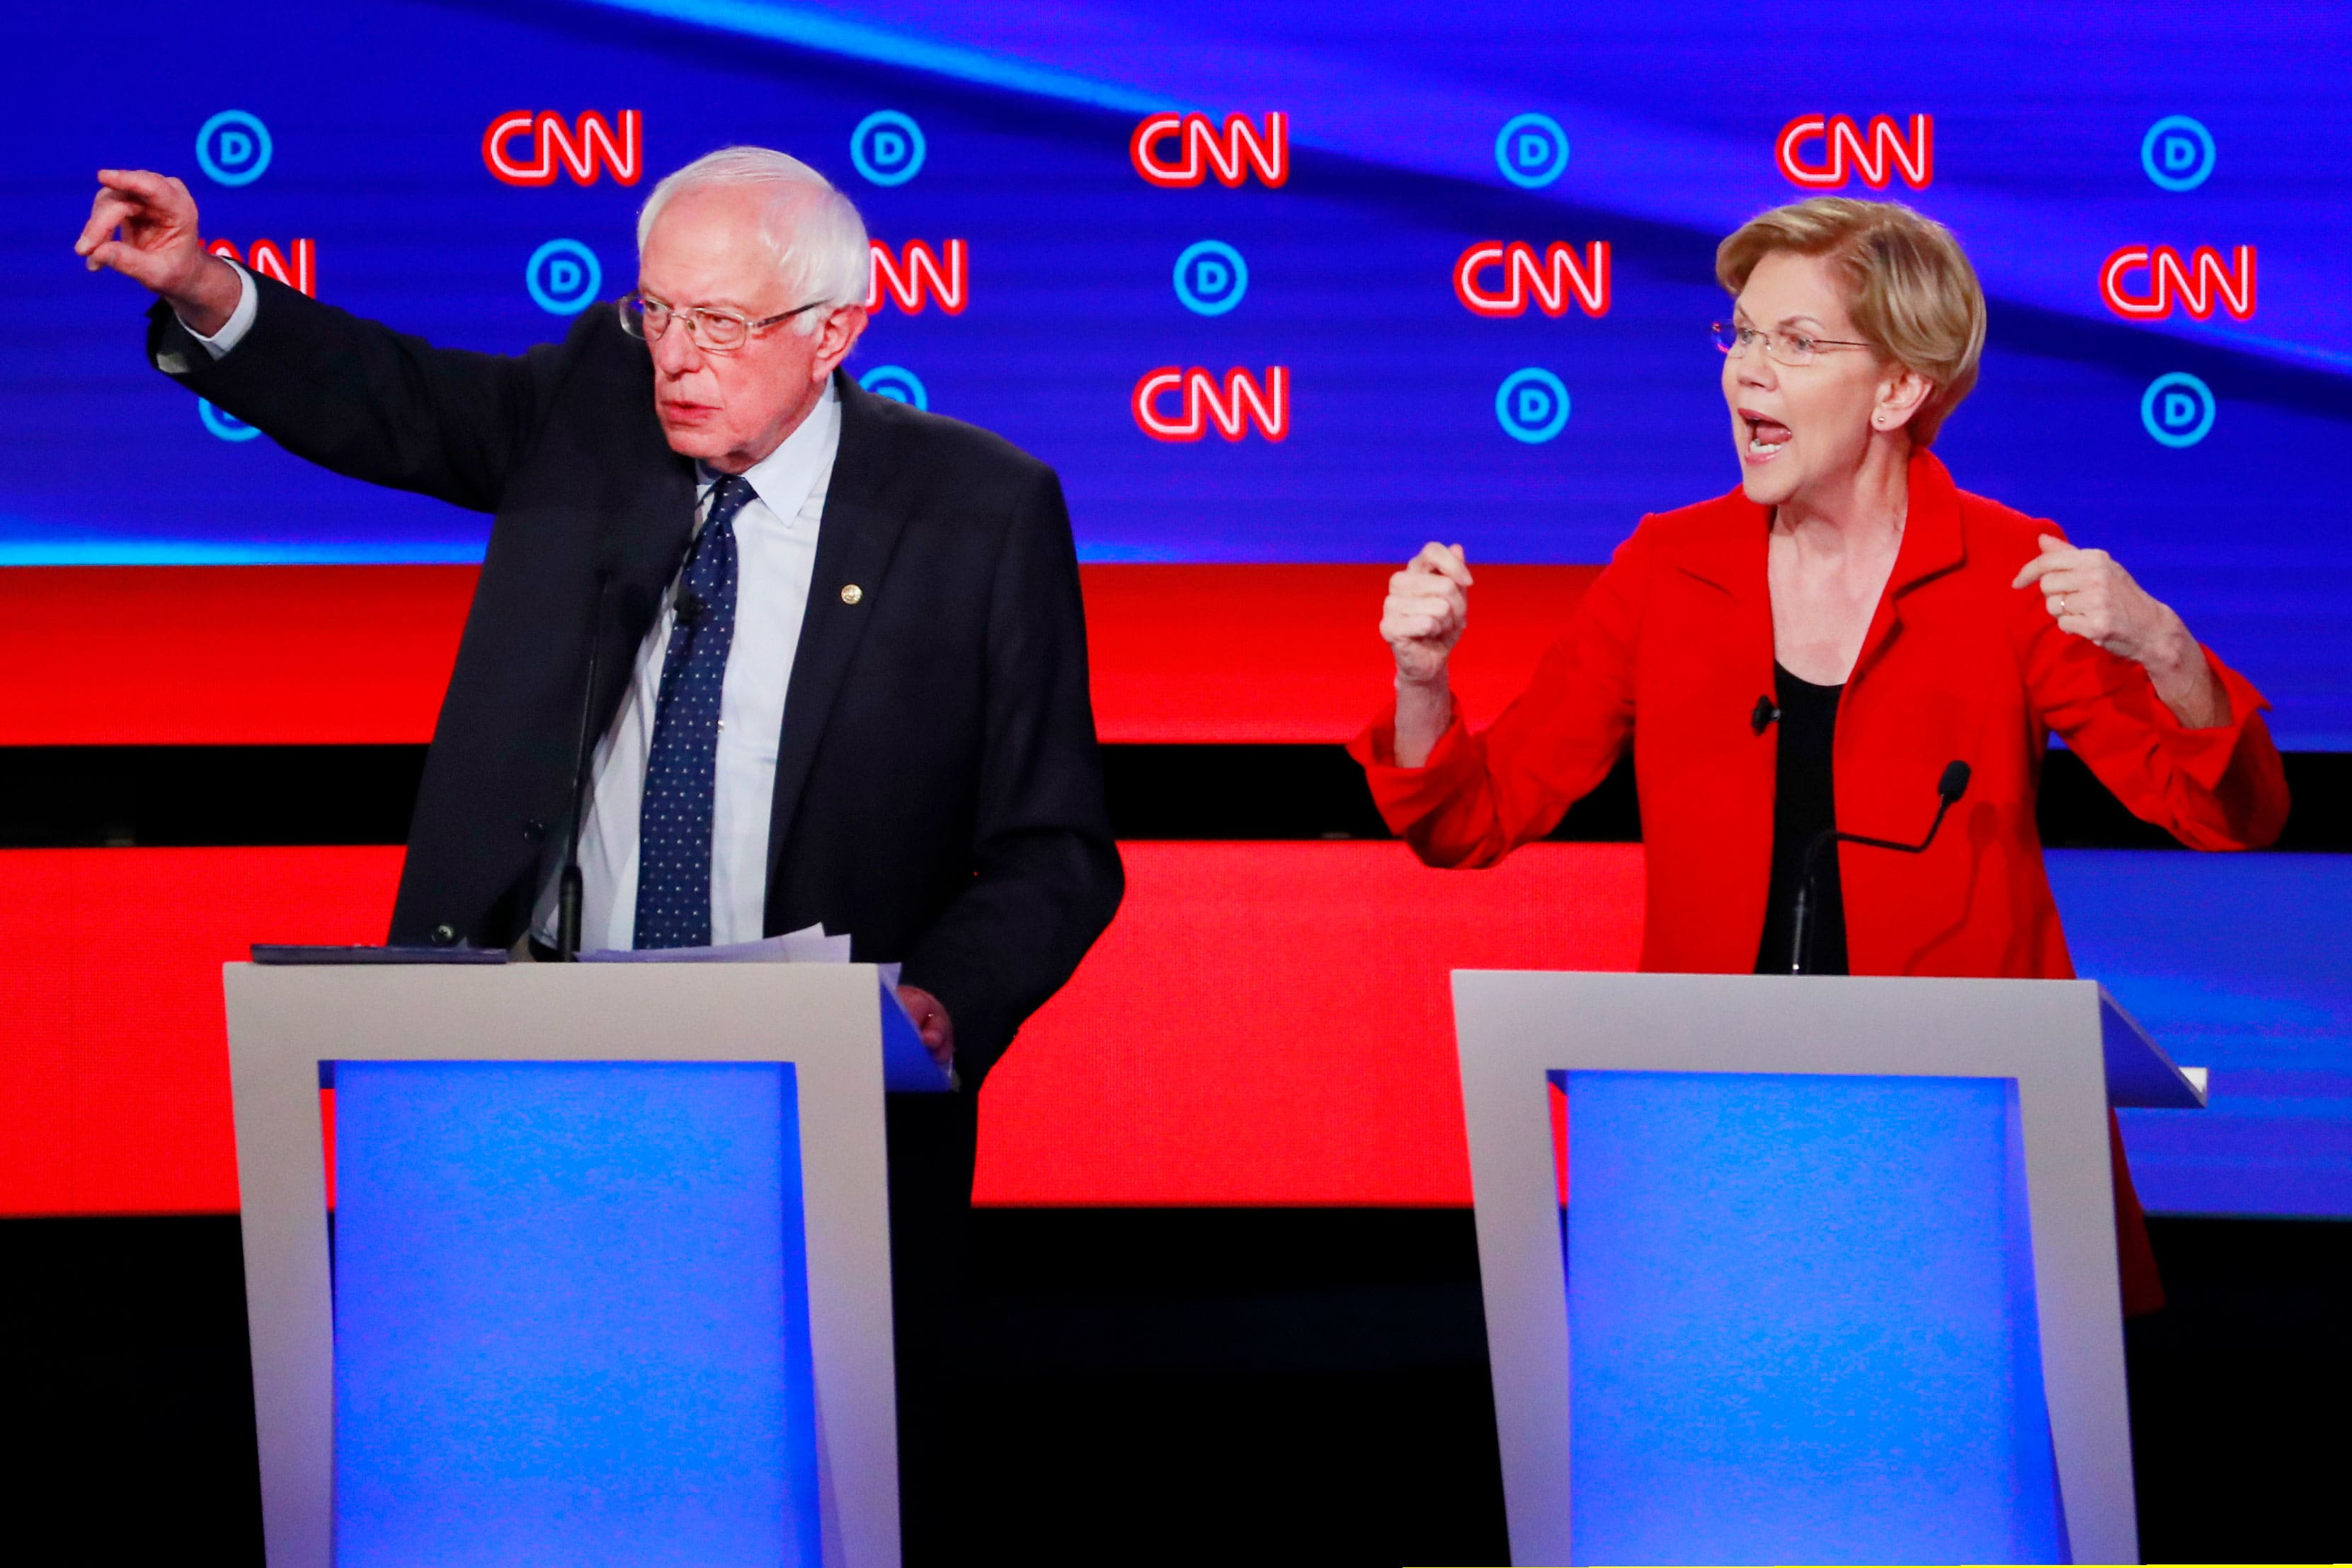 Cramer: Bernie Sanders and his wealth-grabbing 'Leninist' agenda scarier than Elizabeth Warren